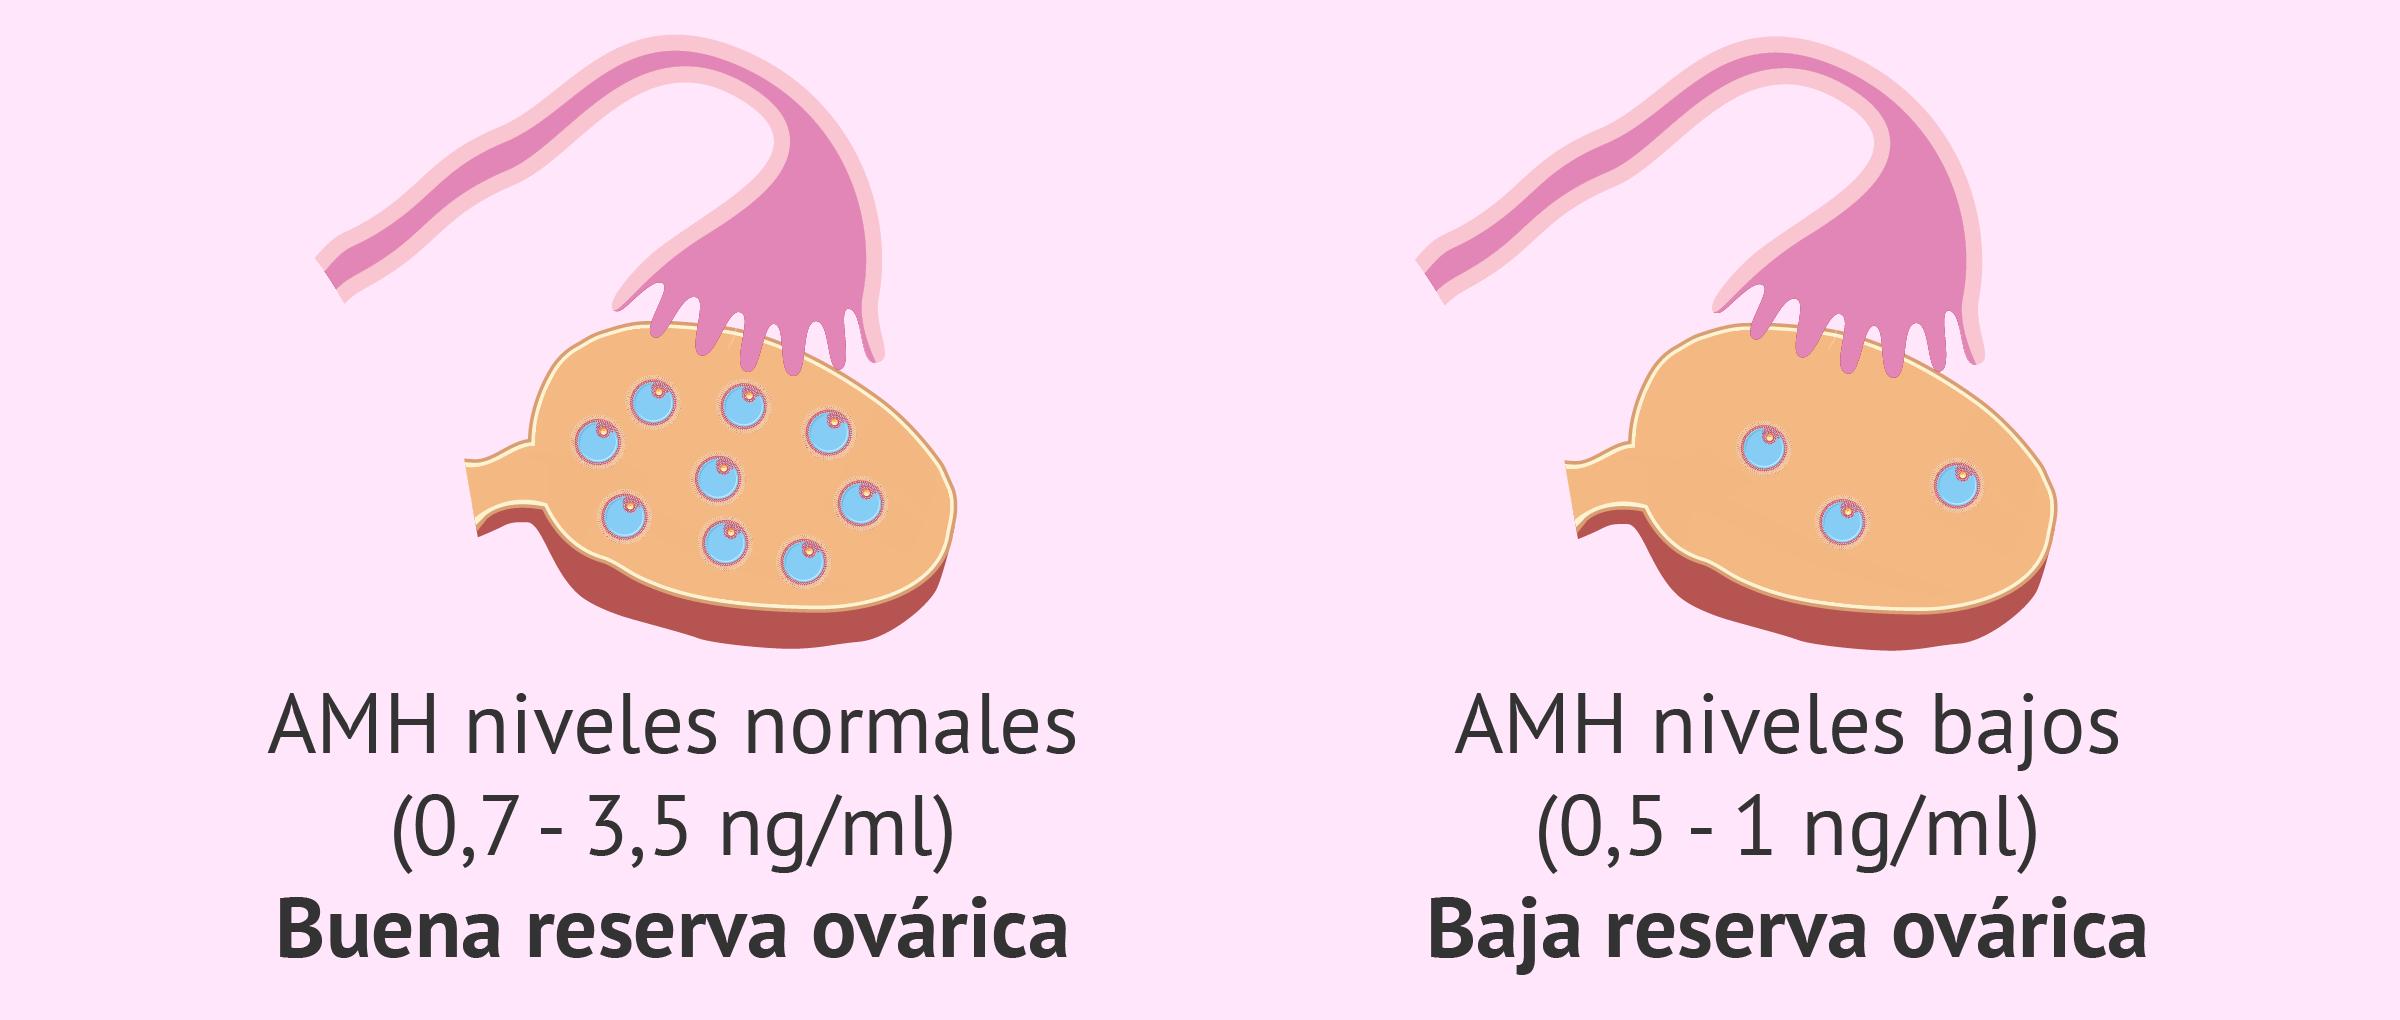 La hormona antimülleriana (AMH): ¿Qué valores son normales?